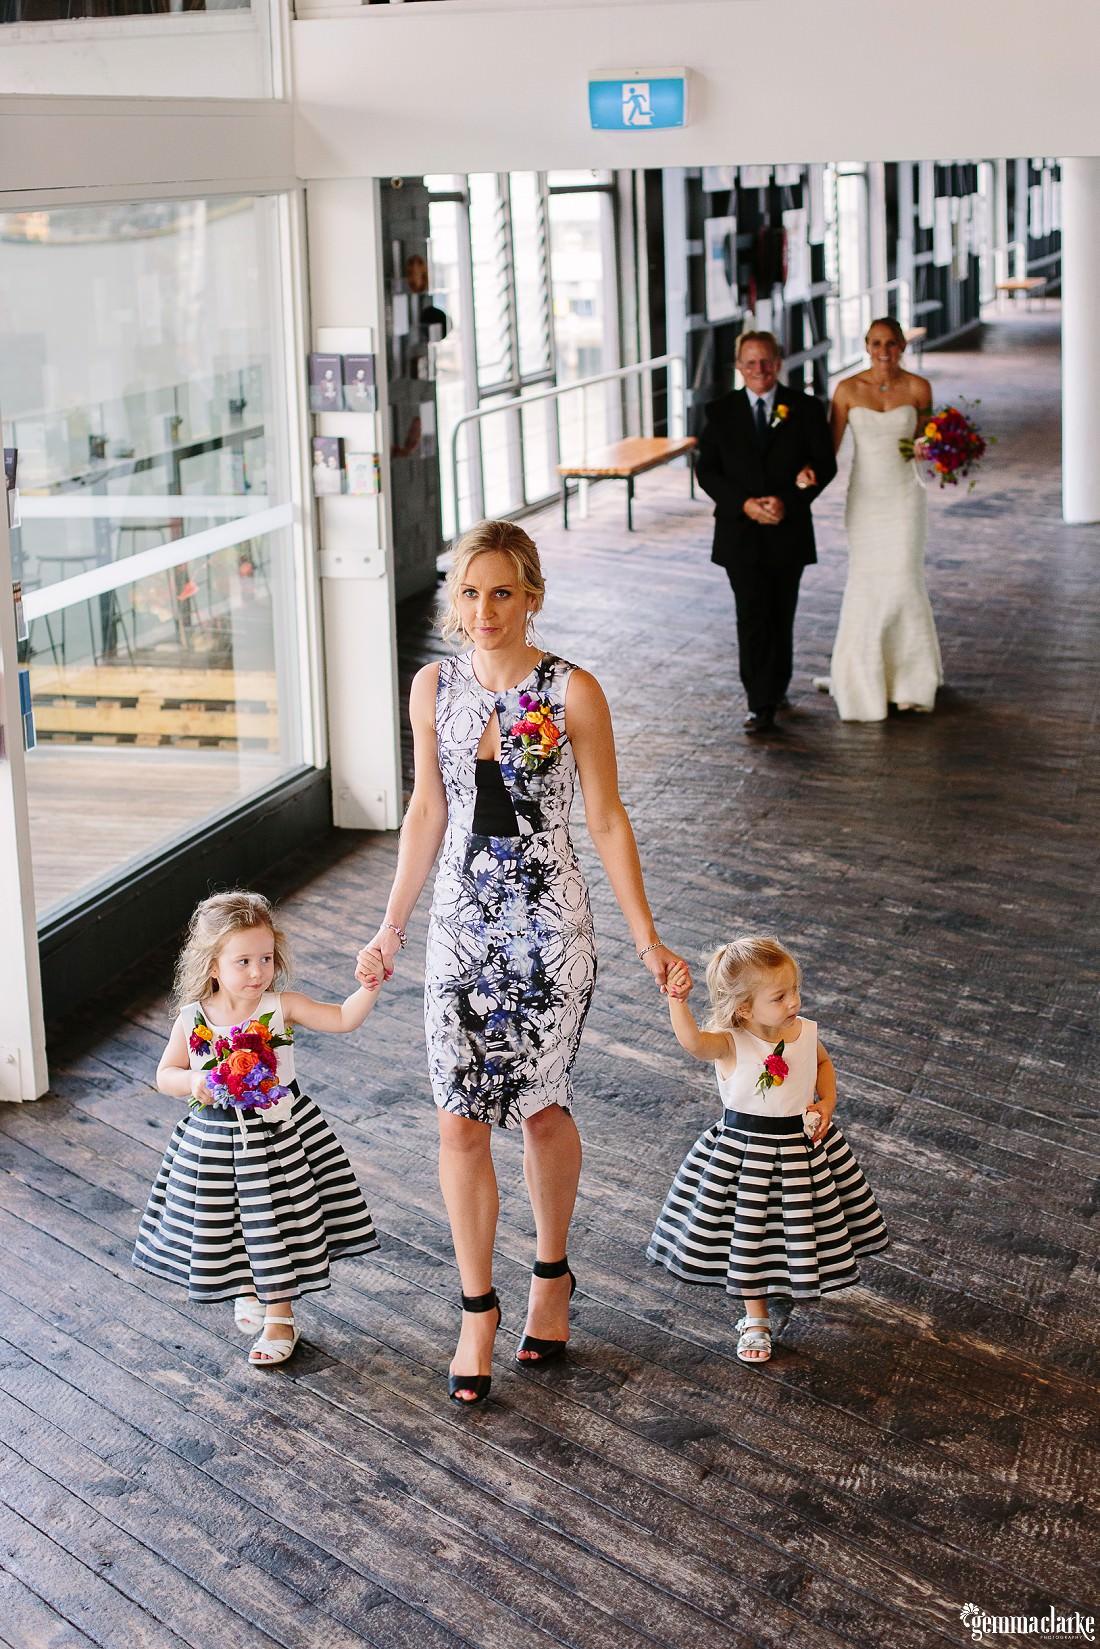 gemmaclarkephotography_cockatoo-island-wedding-photos_the-bar-at-the-end-of-the-wharf_0087